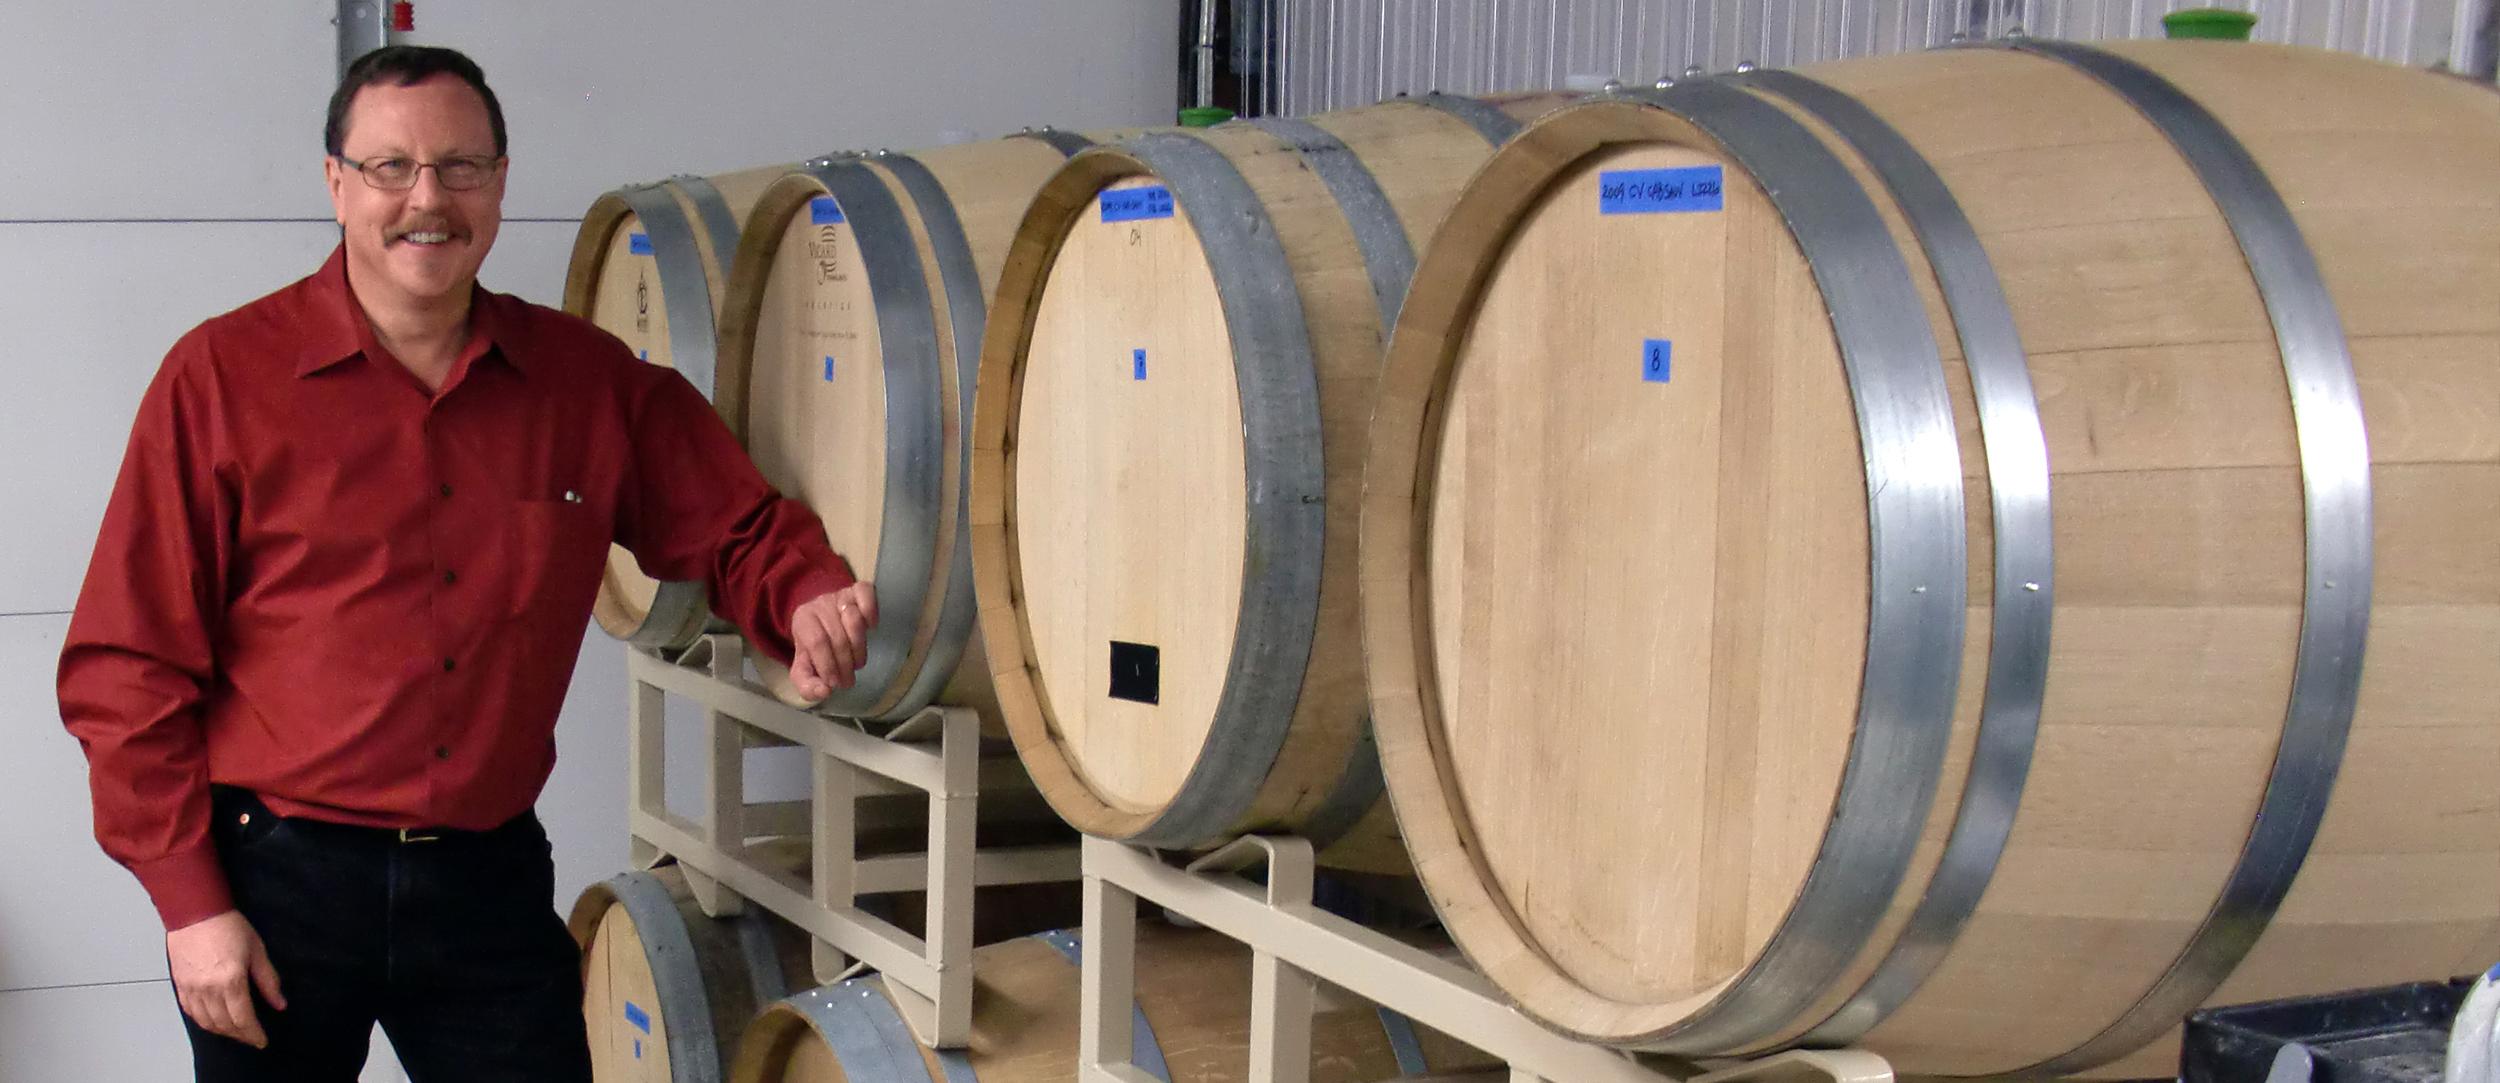 Rob Entrekin, Winemaker